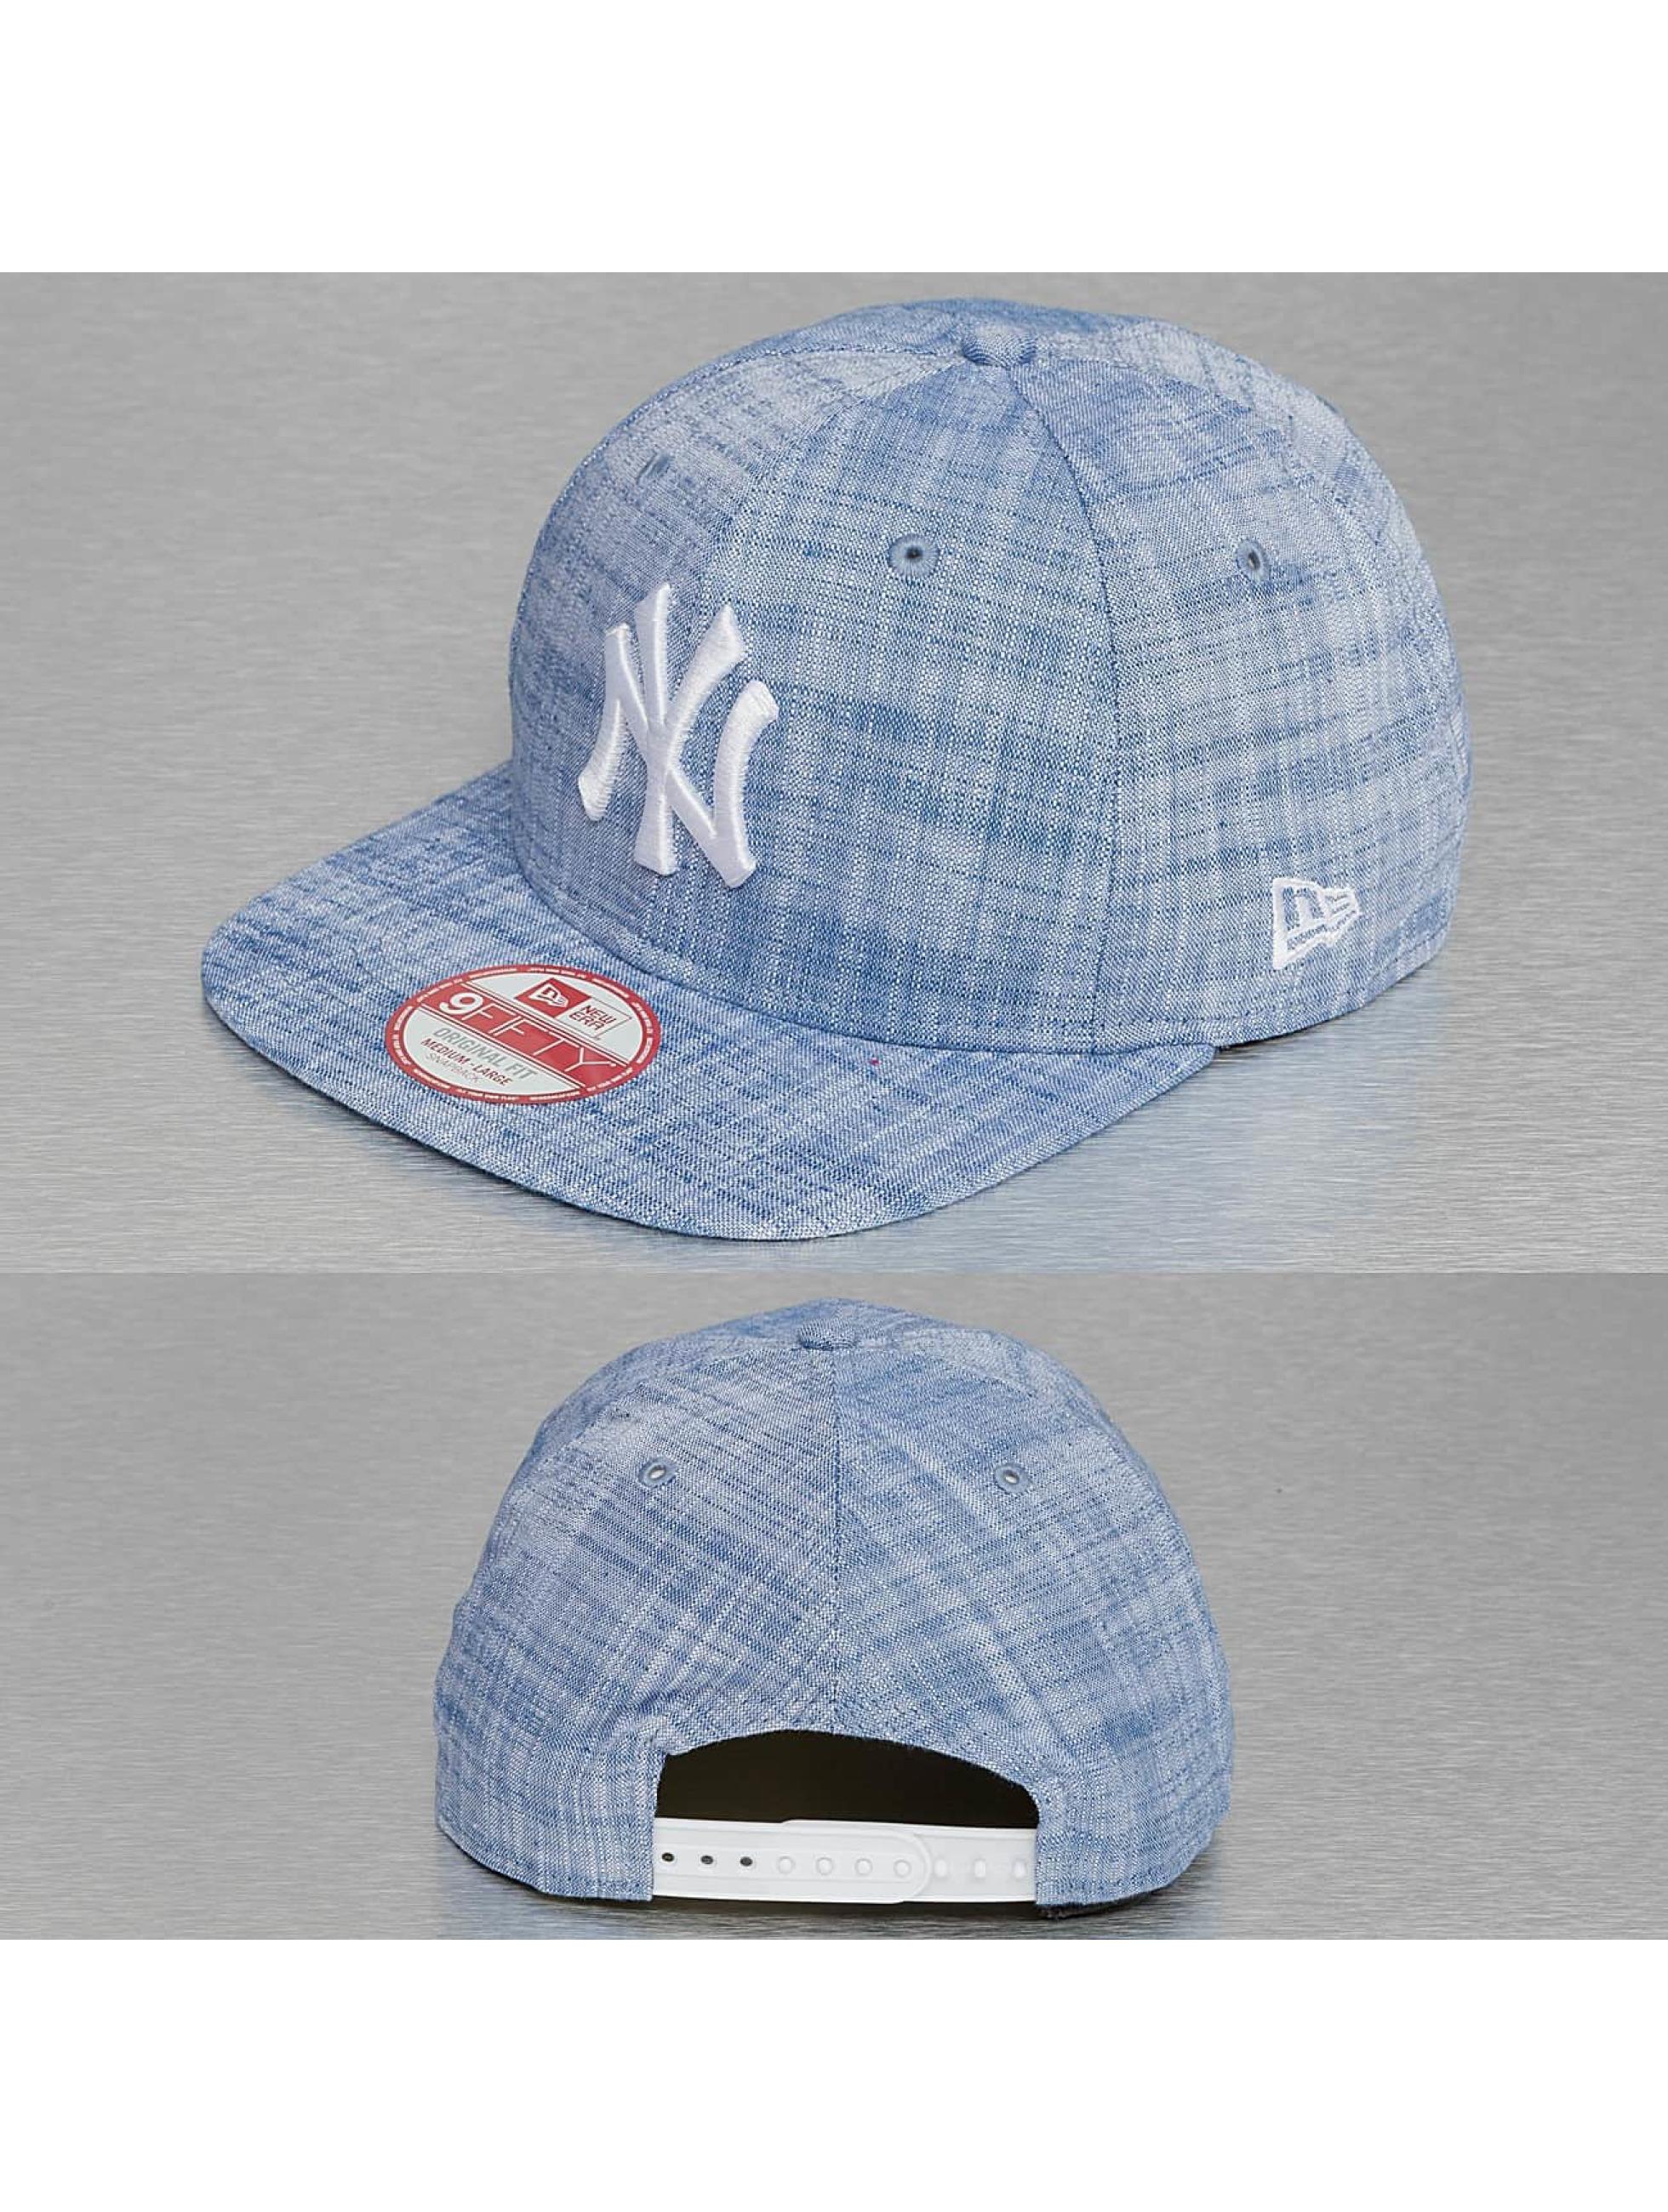 New Era Casquette Snapback & Strapback MLB Chambray NY Yankees bleu